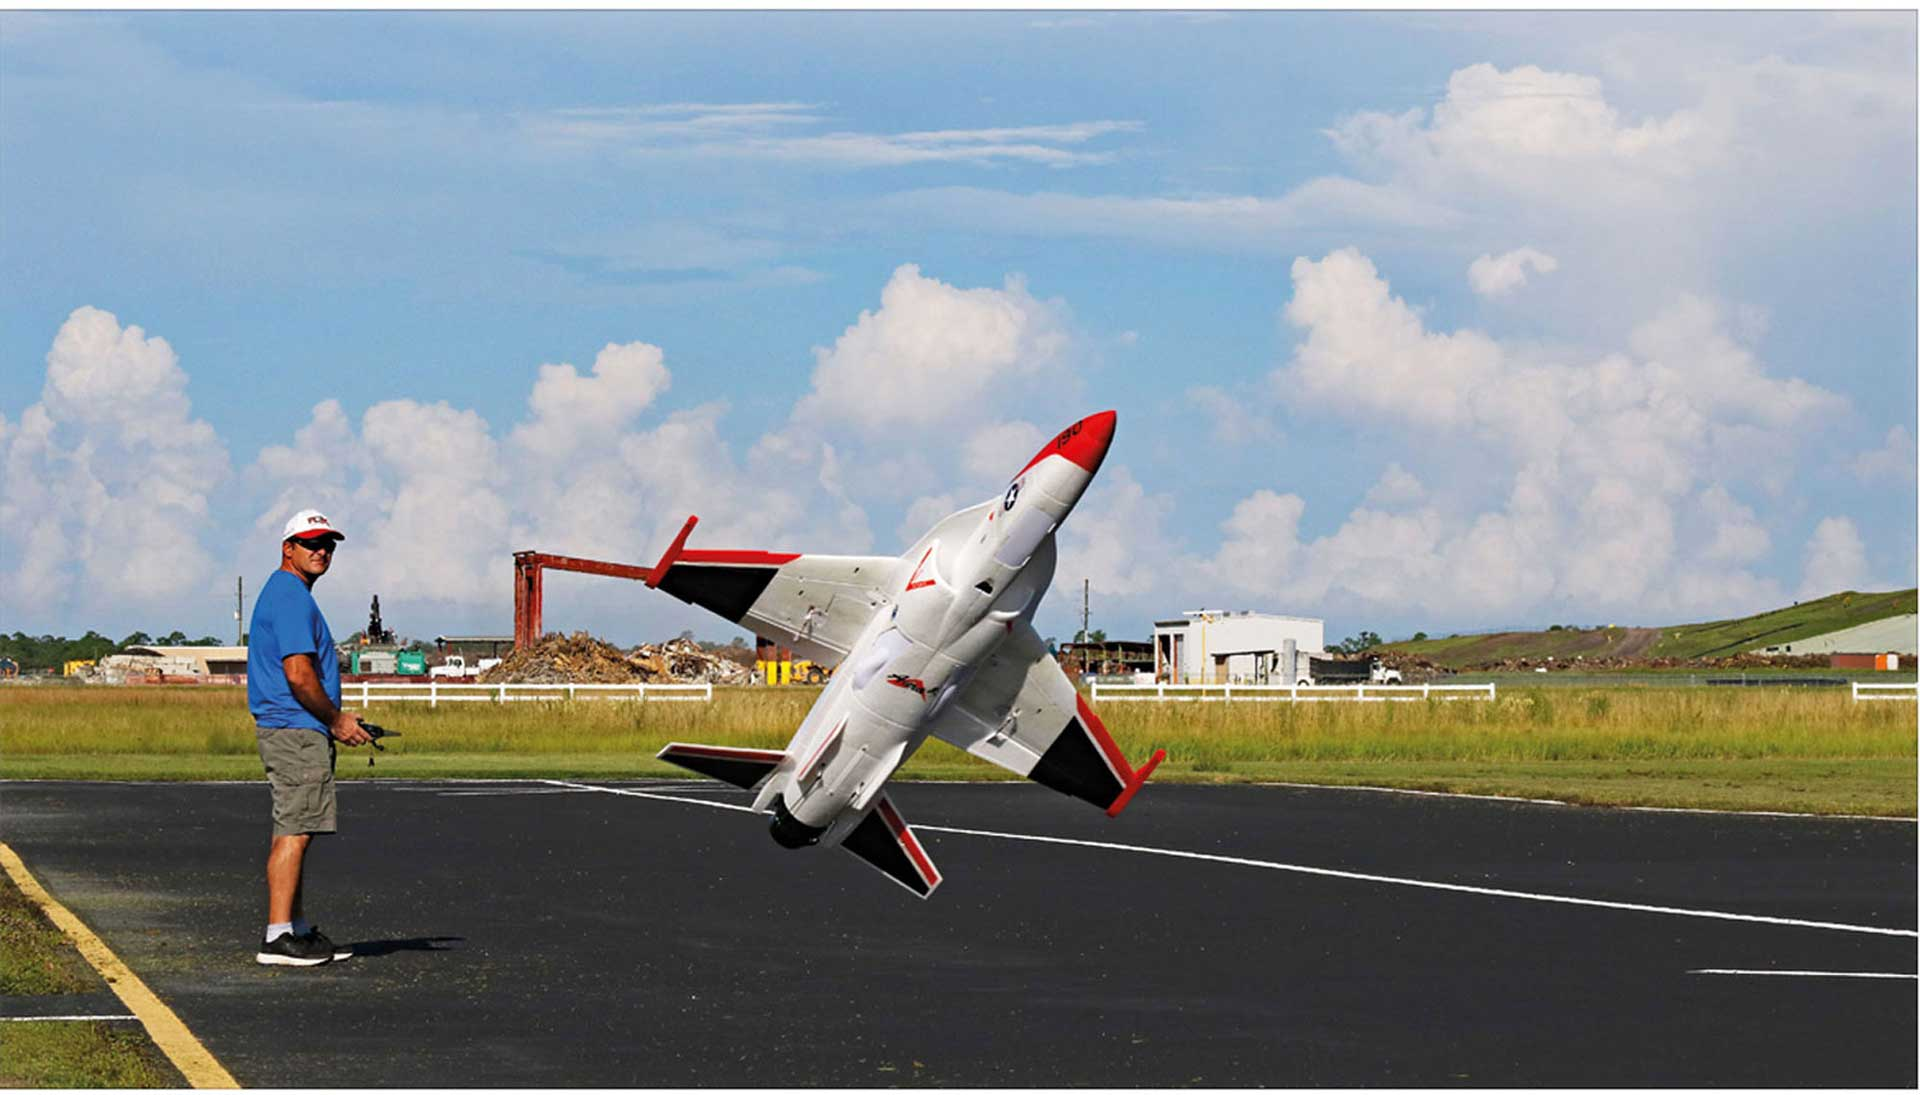 PREMIER AIRCRAFT FLEXJET THRUST VECTOR 90MM EDF IMPELLER JET SUPER PNP WITH AURA 8